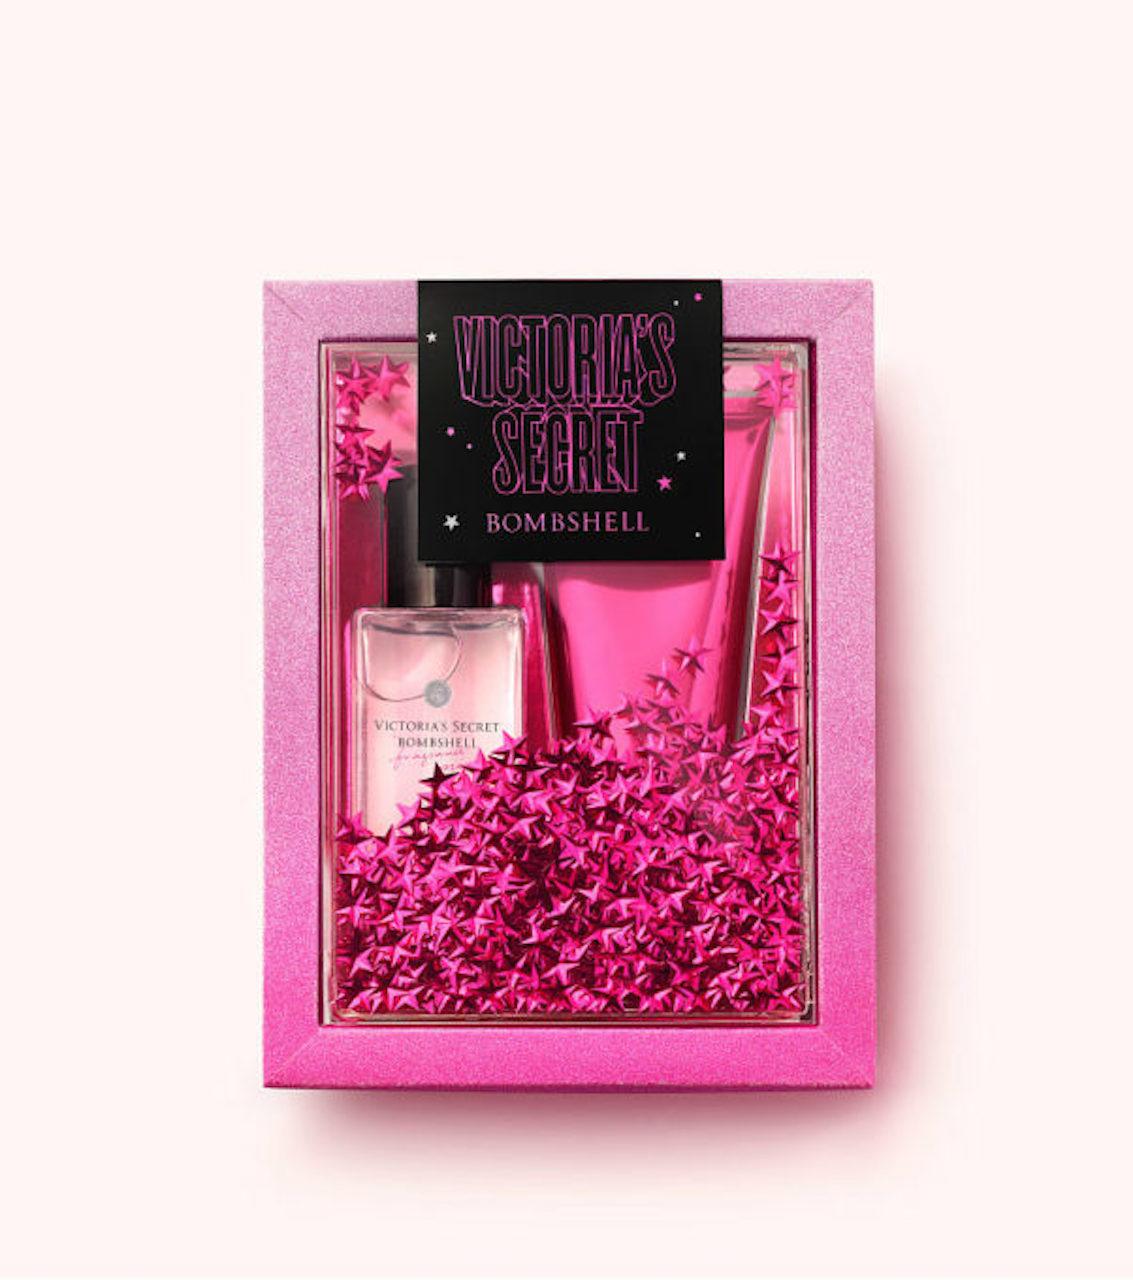 Bộ giftset Victoria's Secret 75ml mist & 100ml lotion - Bombshell (Mỹ)